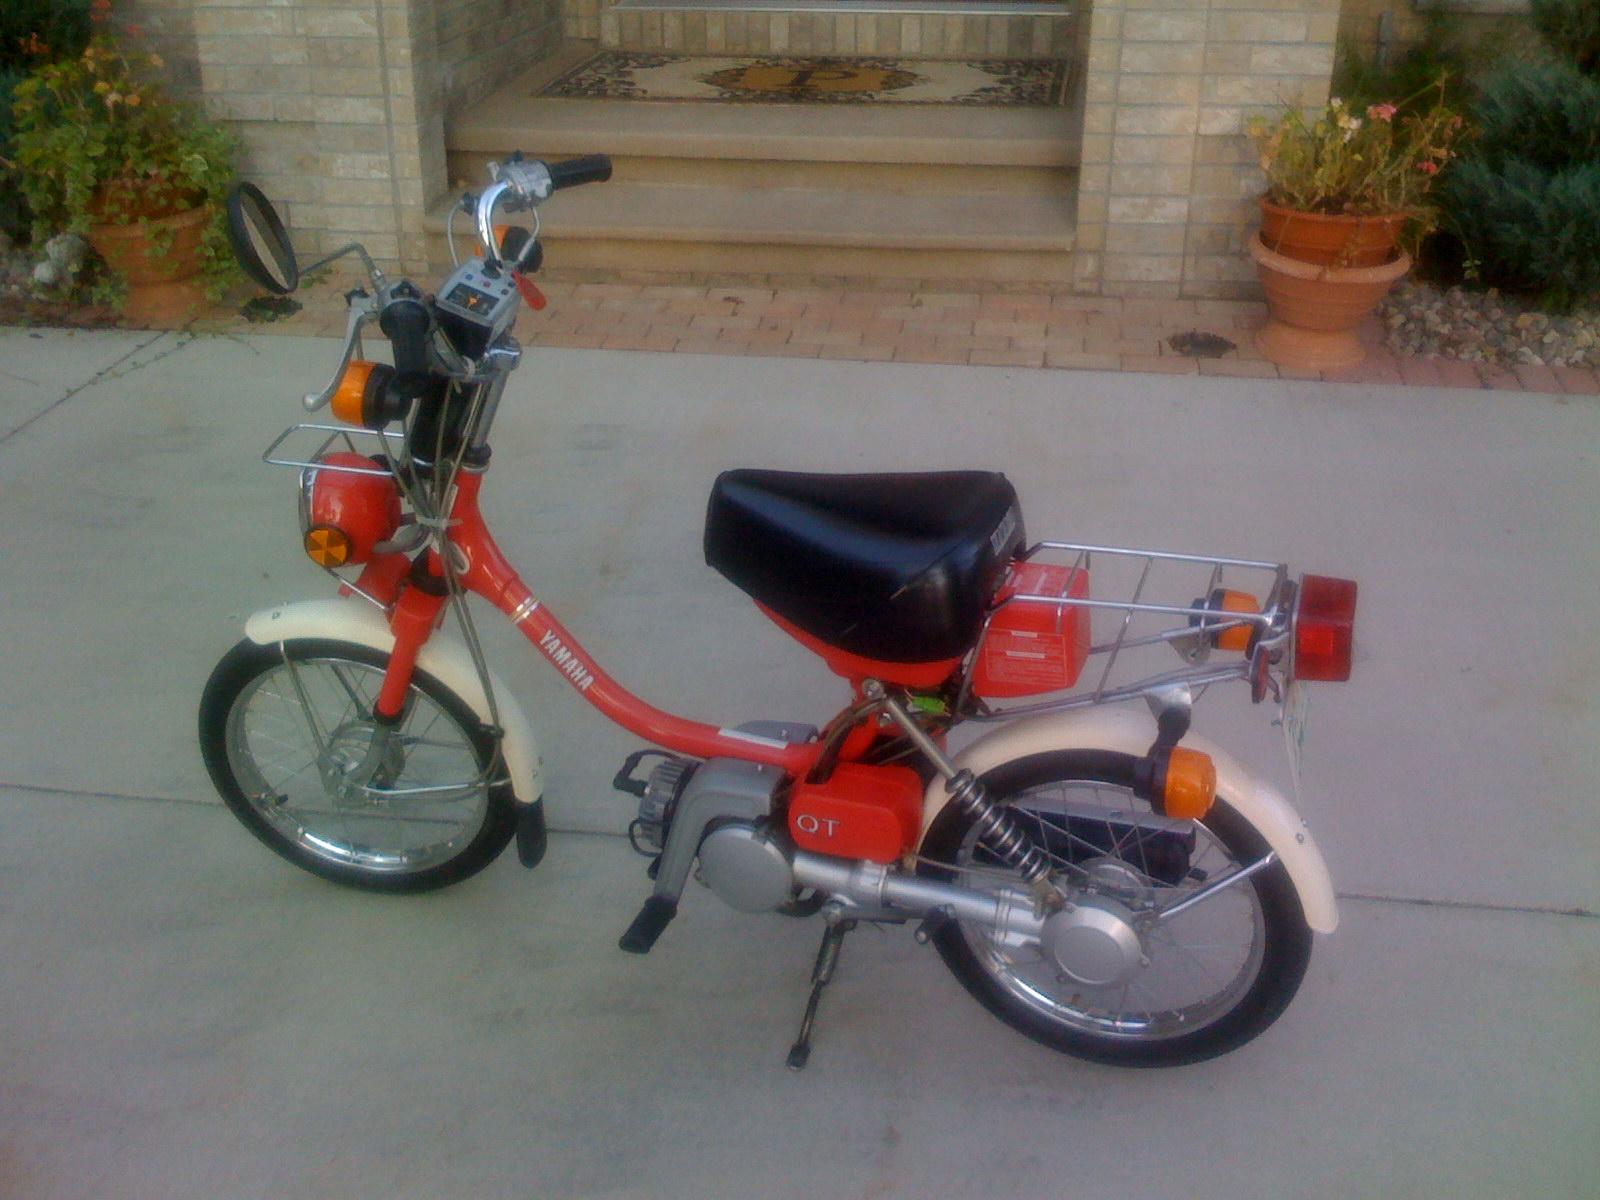 1984 Yamaha QT50 Carburetor Repair — Moped Army